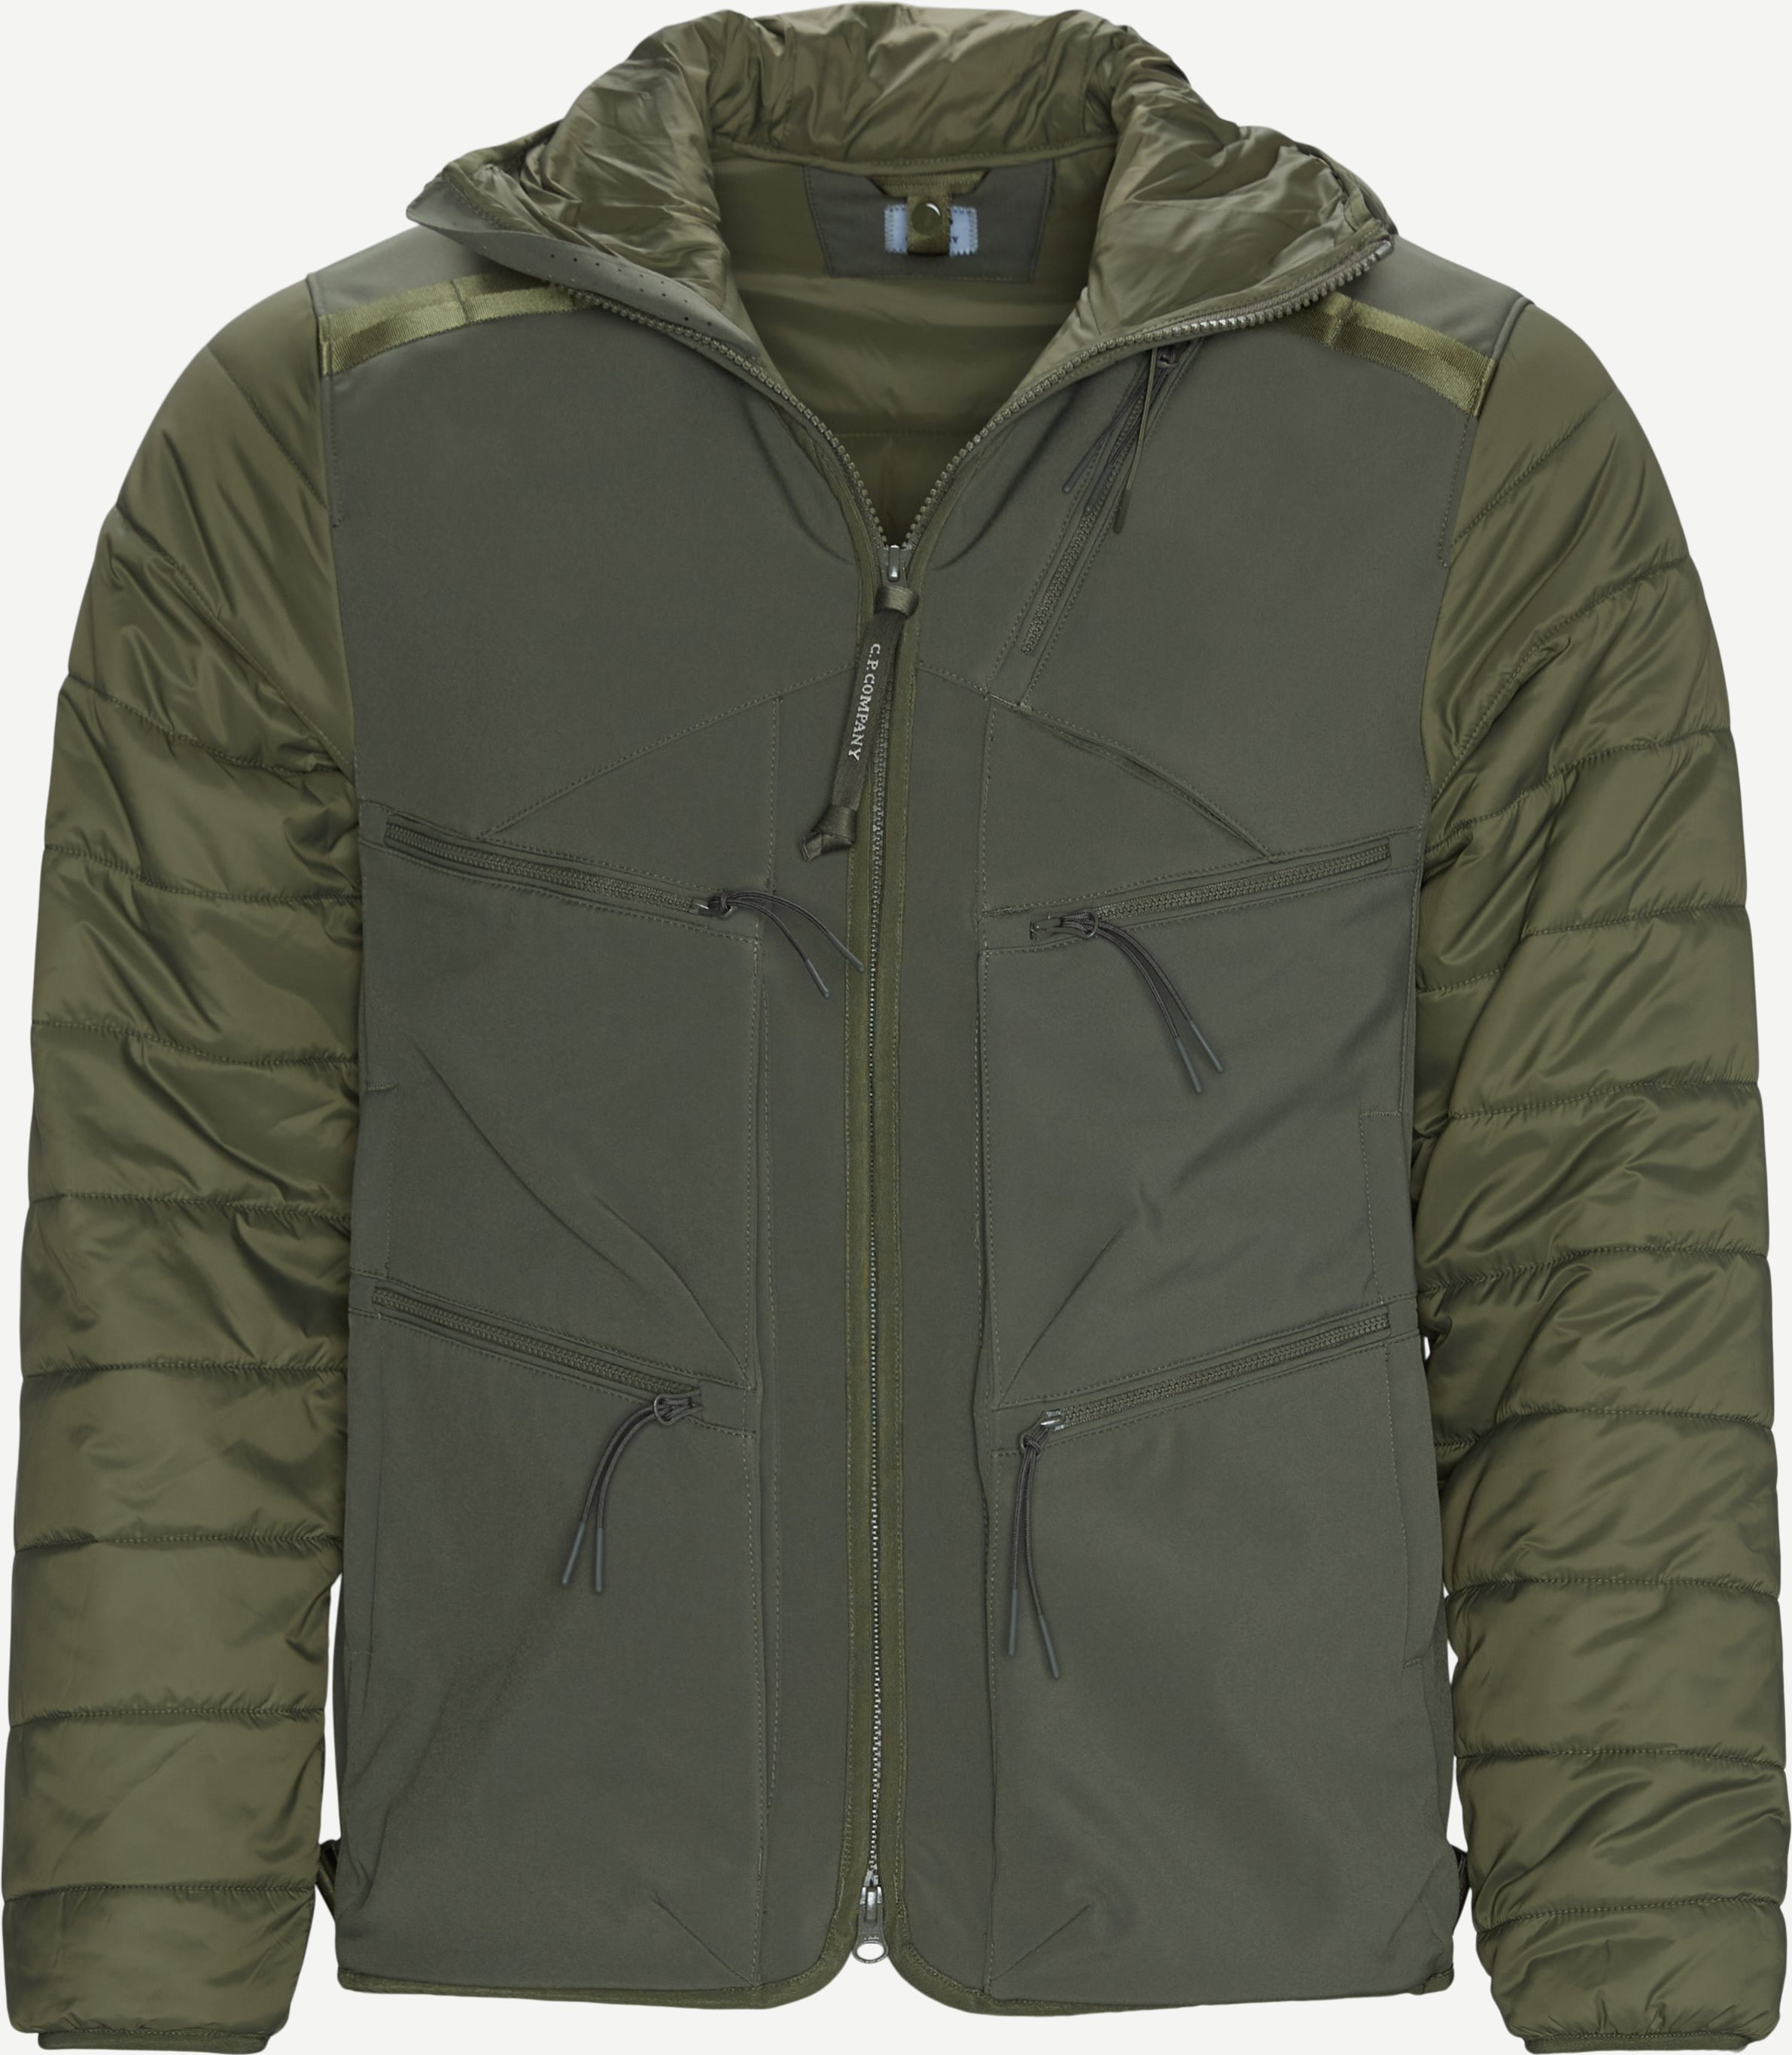 Shell-R Goggle Jacket - Jakker - Regular fit - Army